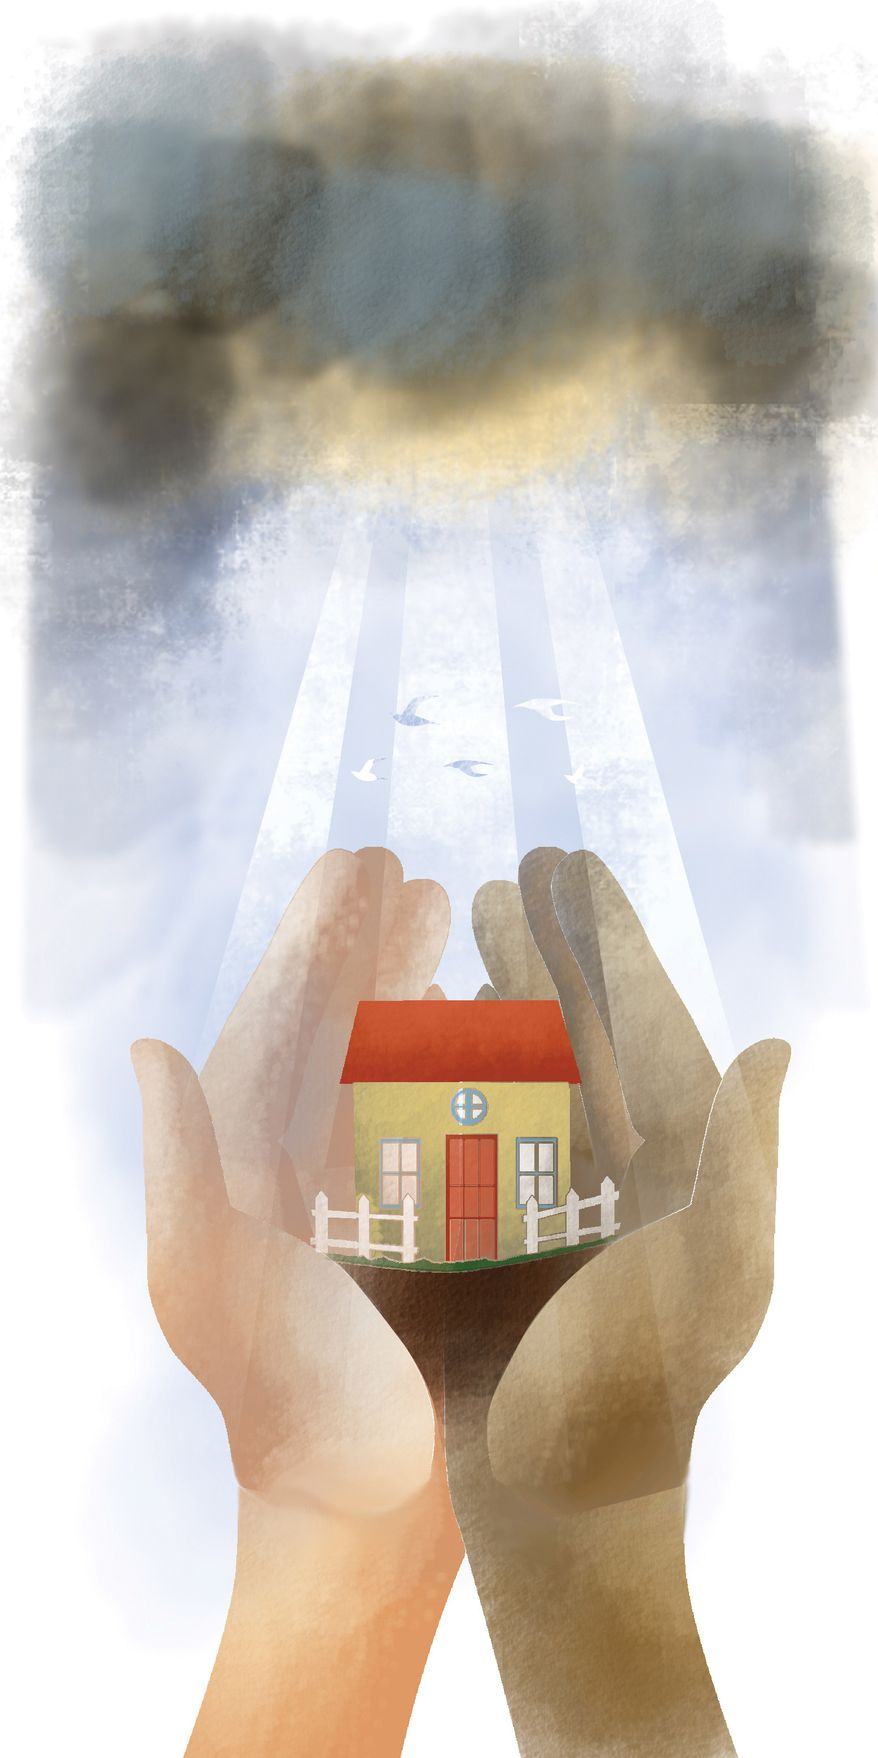 Illustration: Thanksgiving prayer by Linas Garsys for The Washington Times